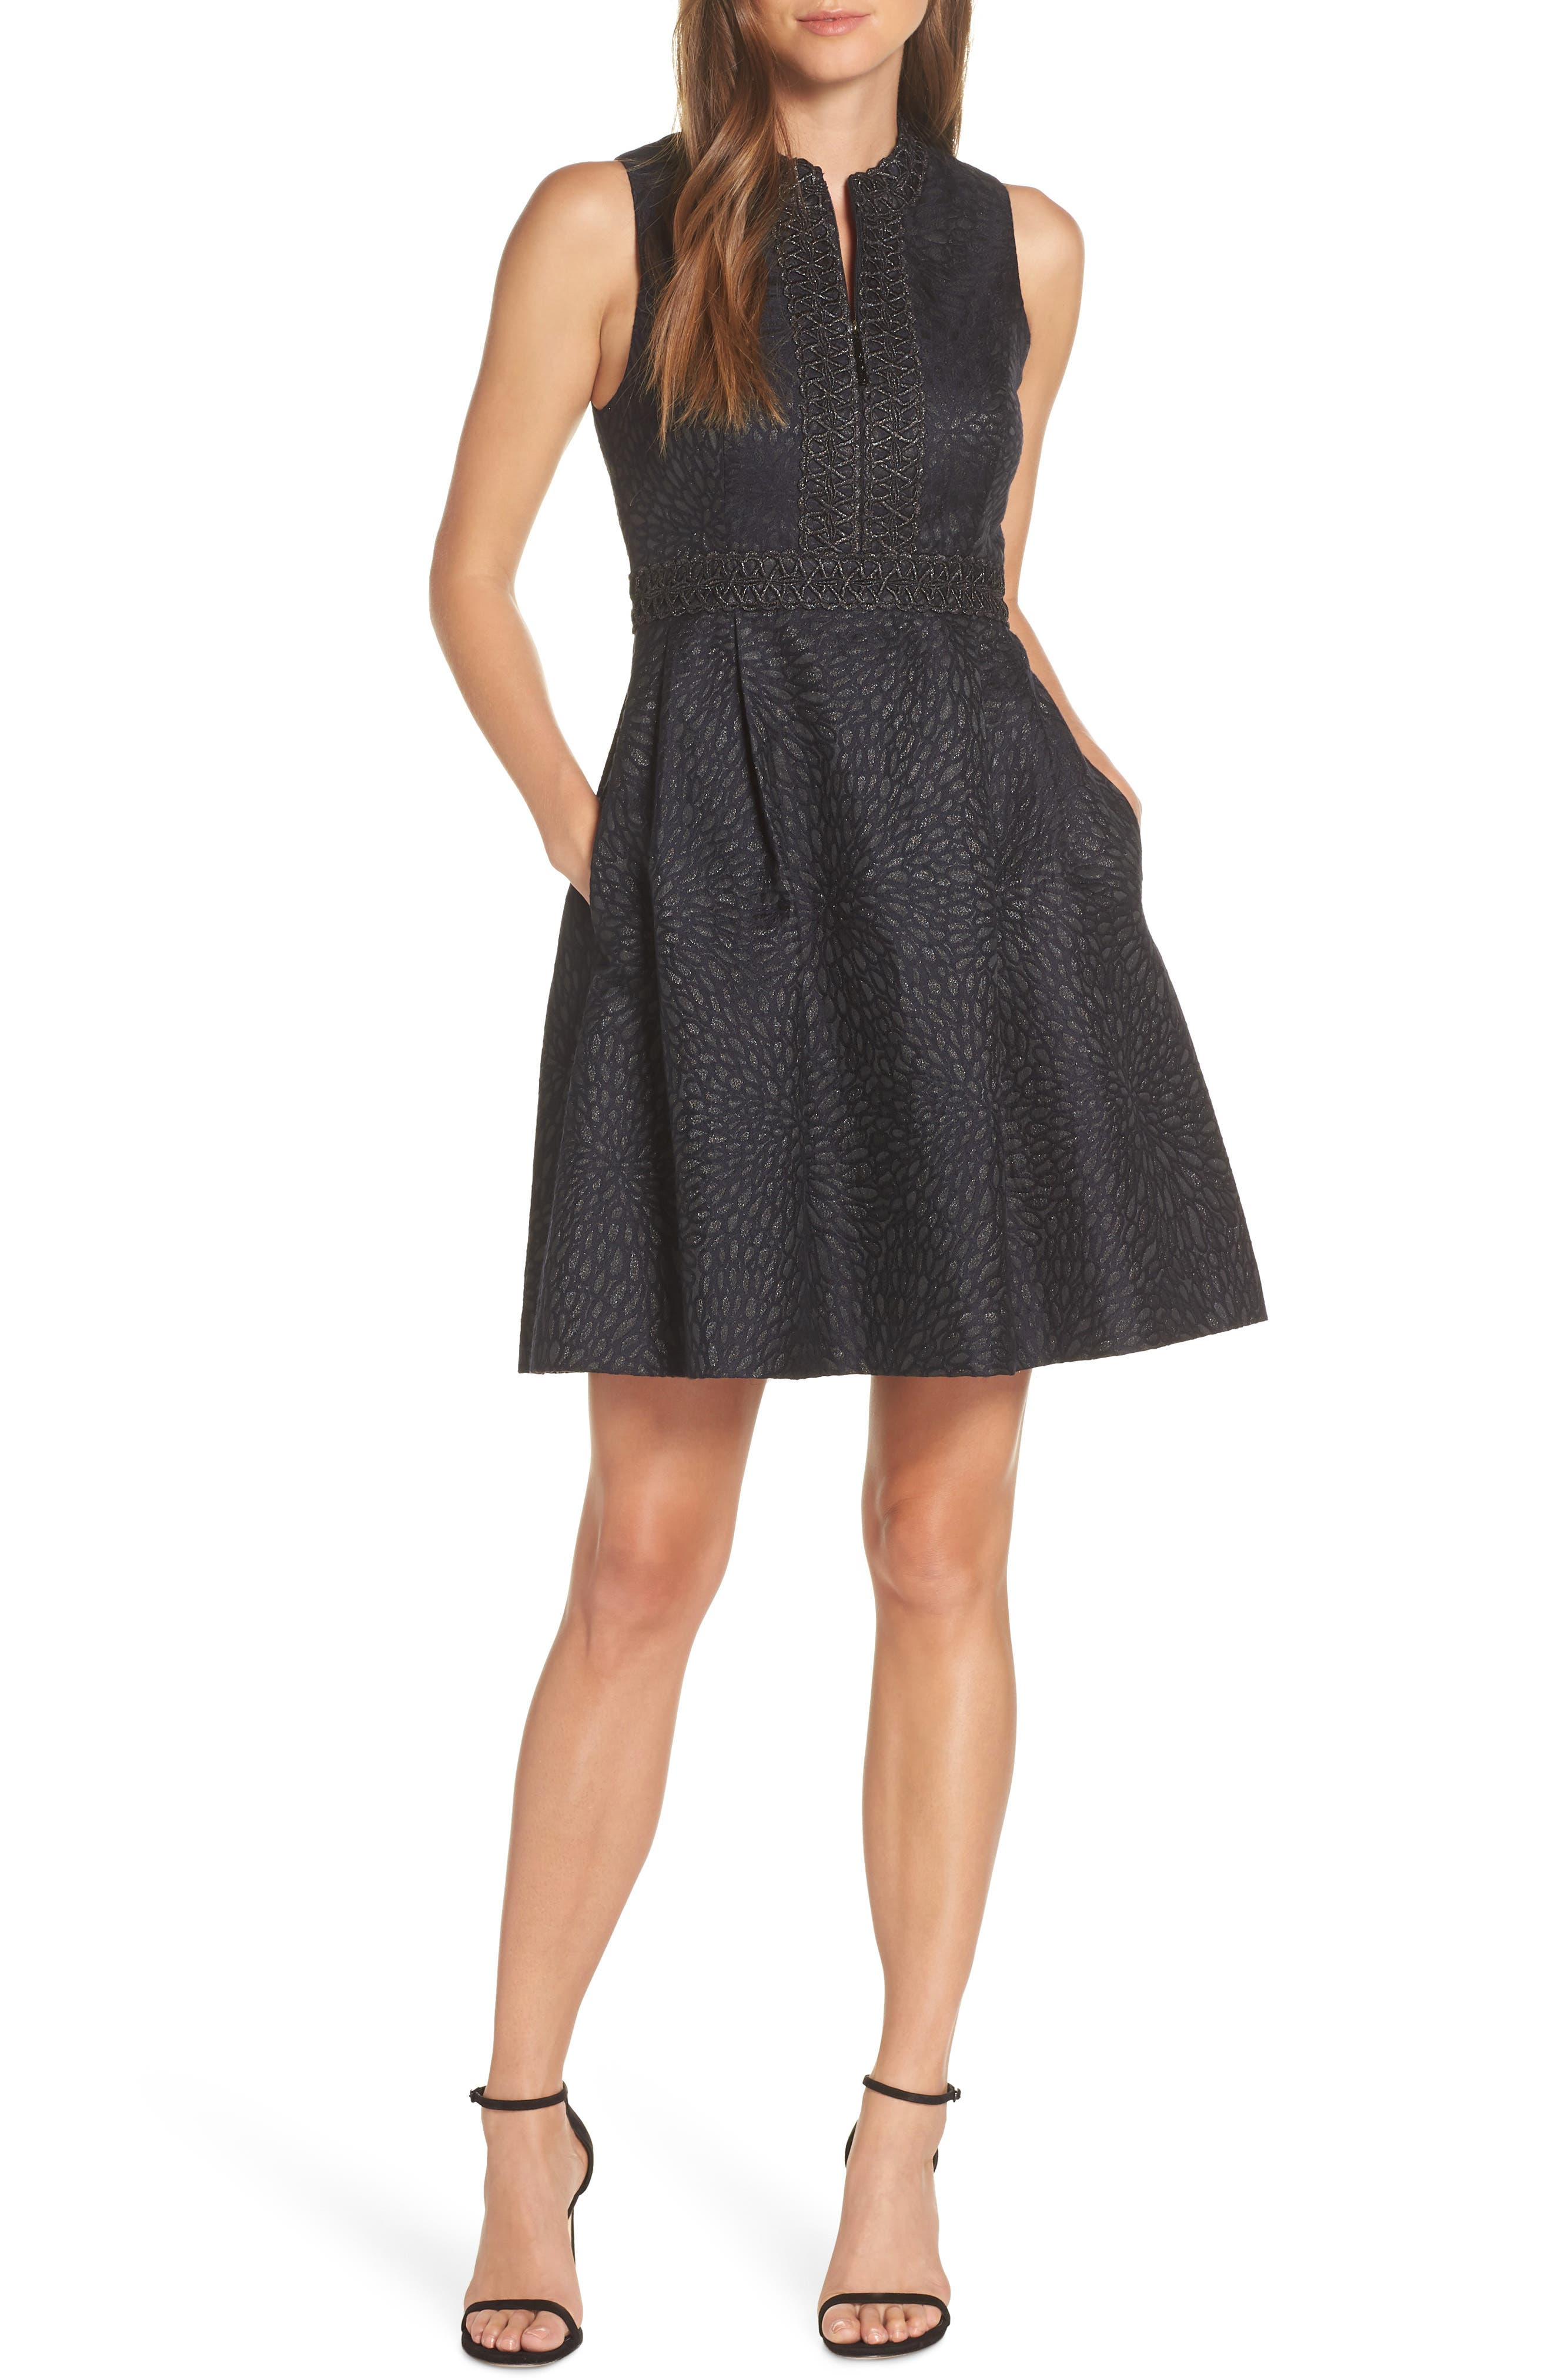 Lilly Pulitzer Franci Jacquard Dress